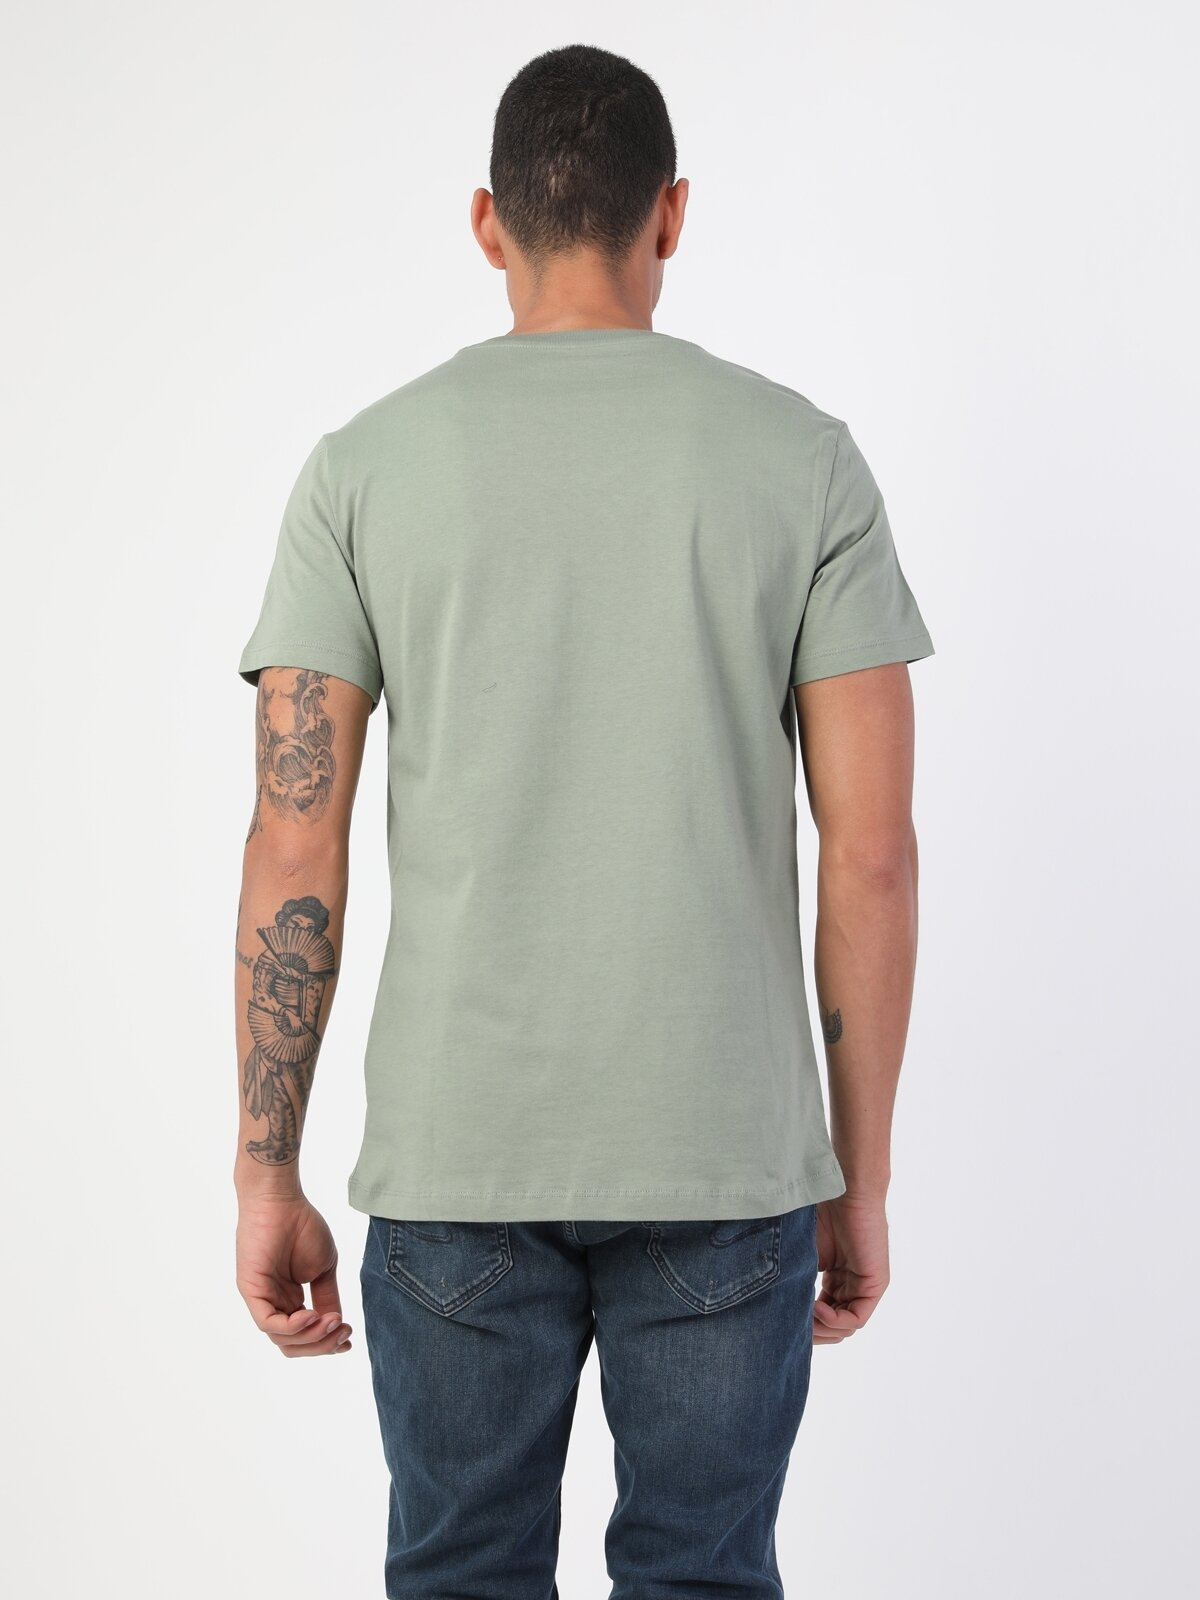 Regular Fit Bisiklet Yaka Erkek Yeşil Kısa Kol Tişört